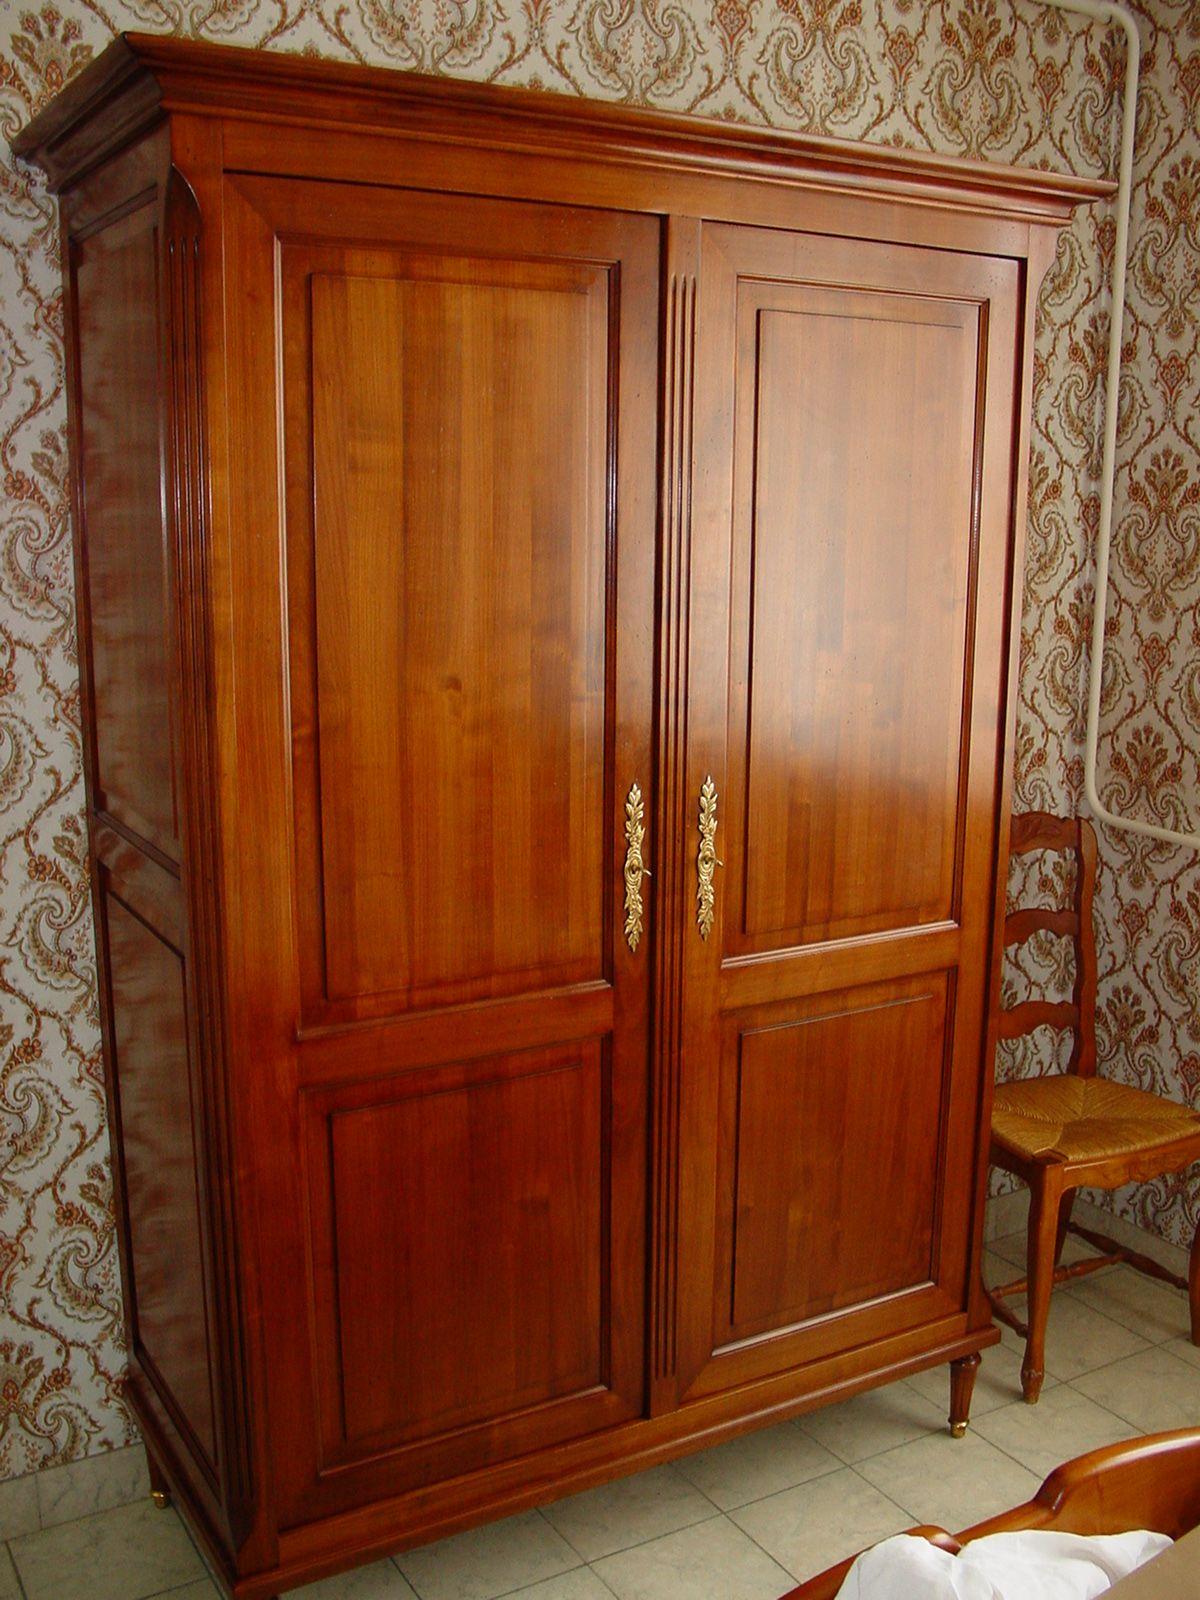 Antique Armoire Bedroom